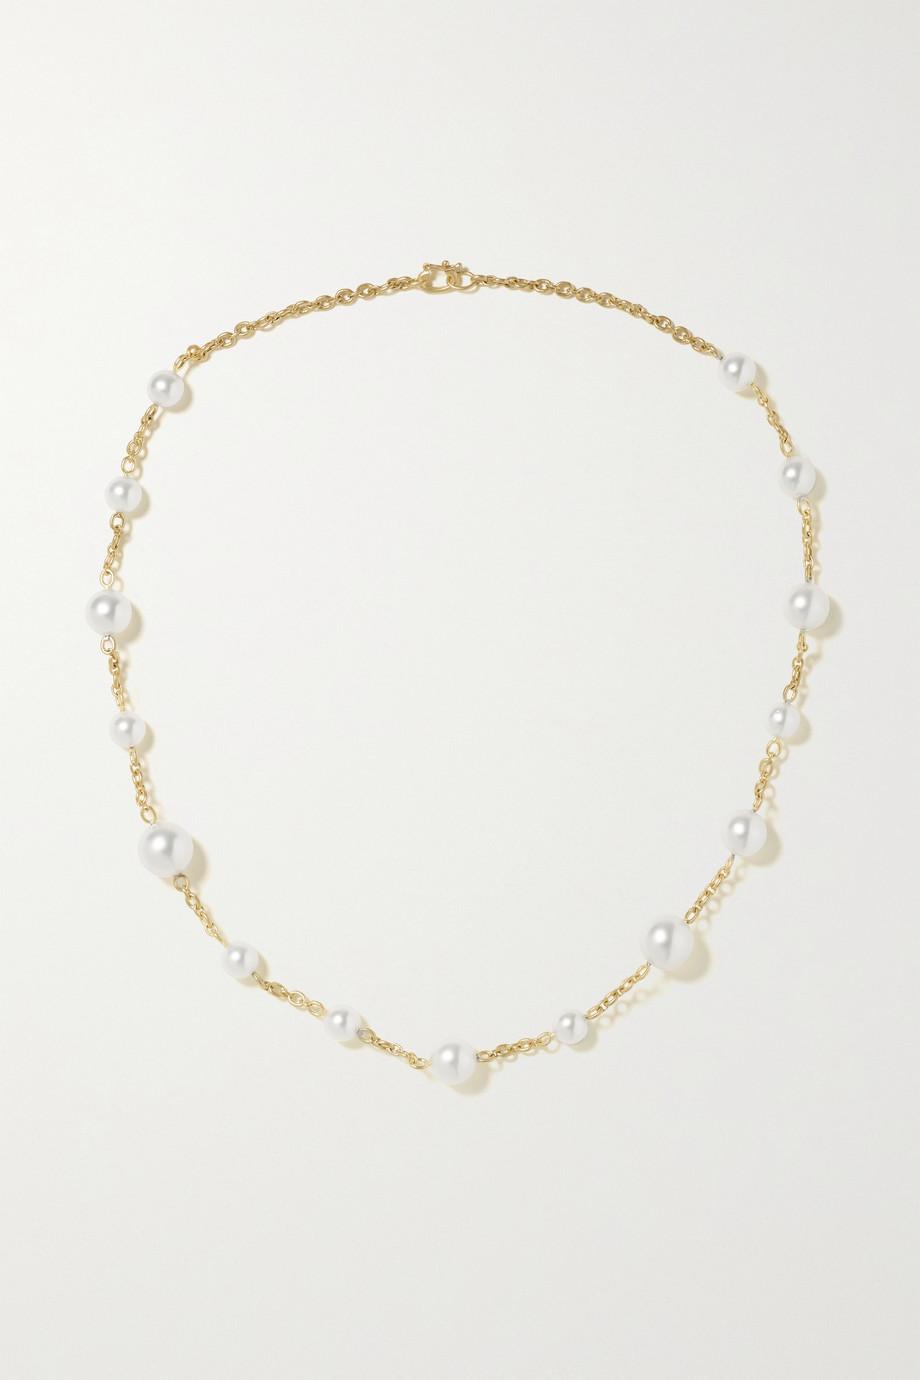 Irene Neuwirth Collier en or 18 carats et perles Gumball